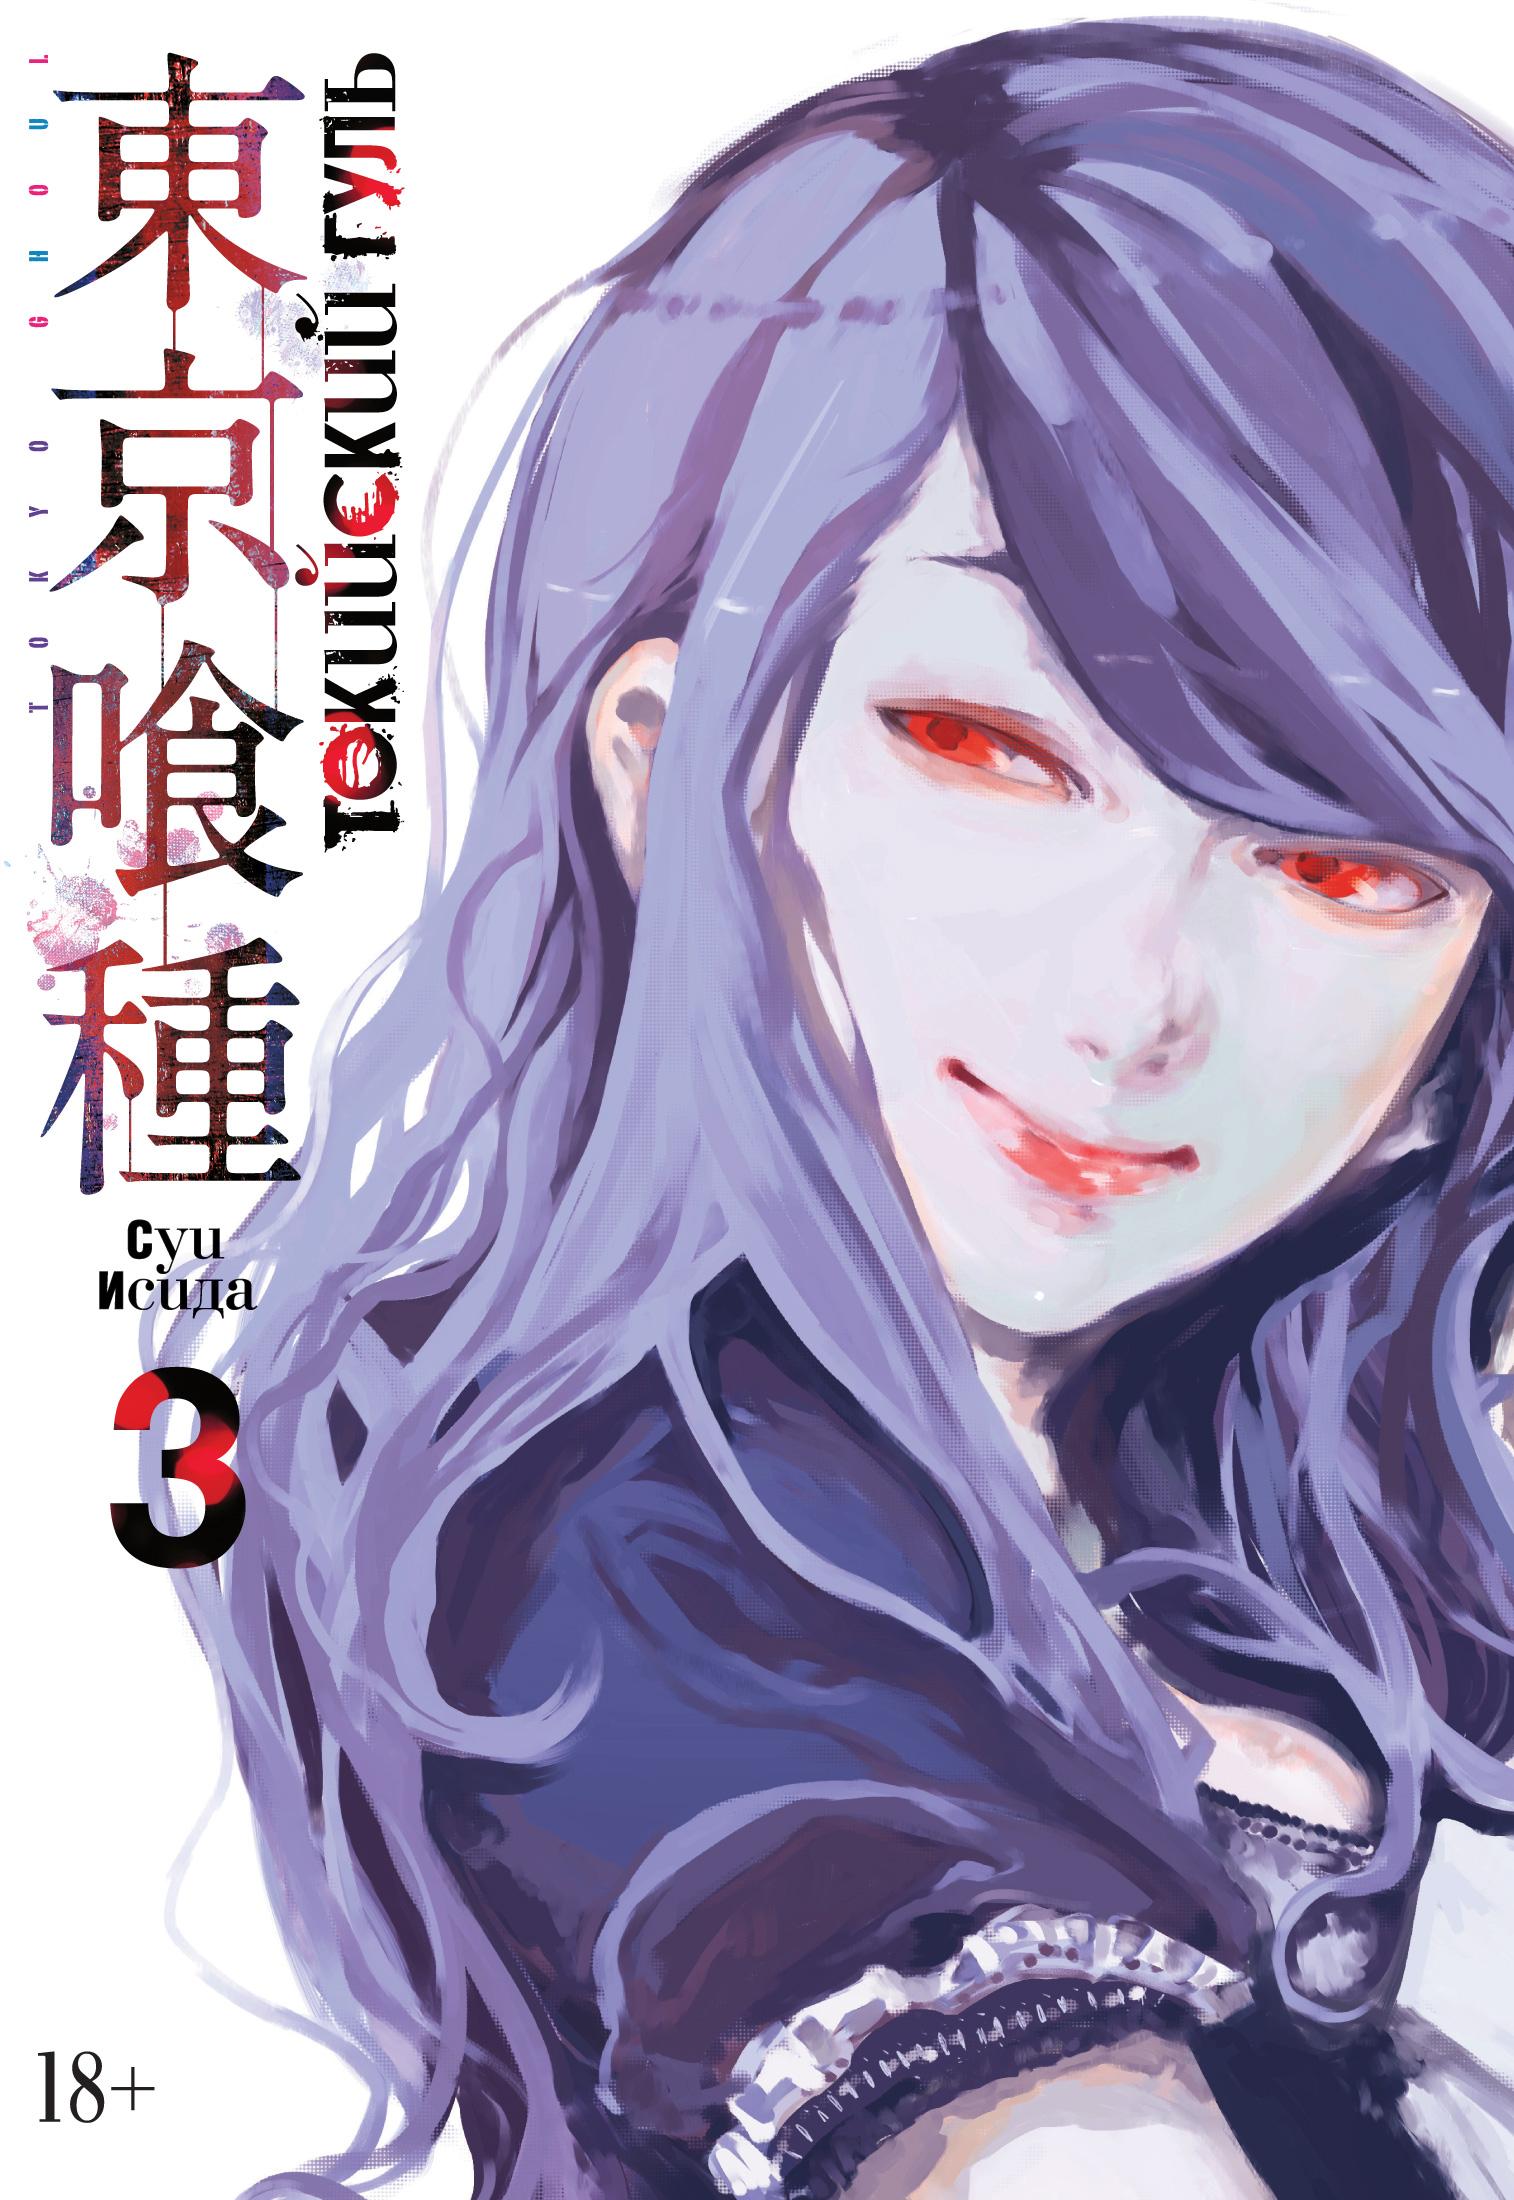 Токийский гуль. Книга 3 Суи Исида